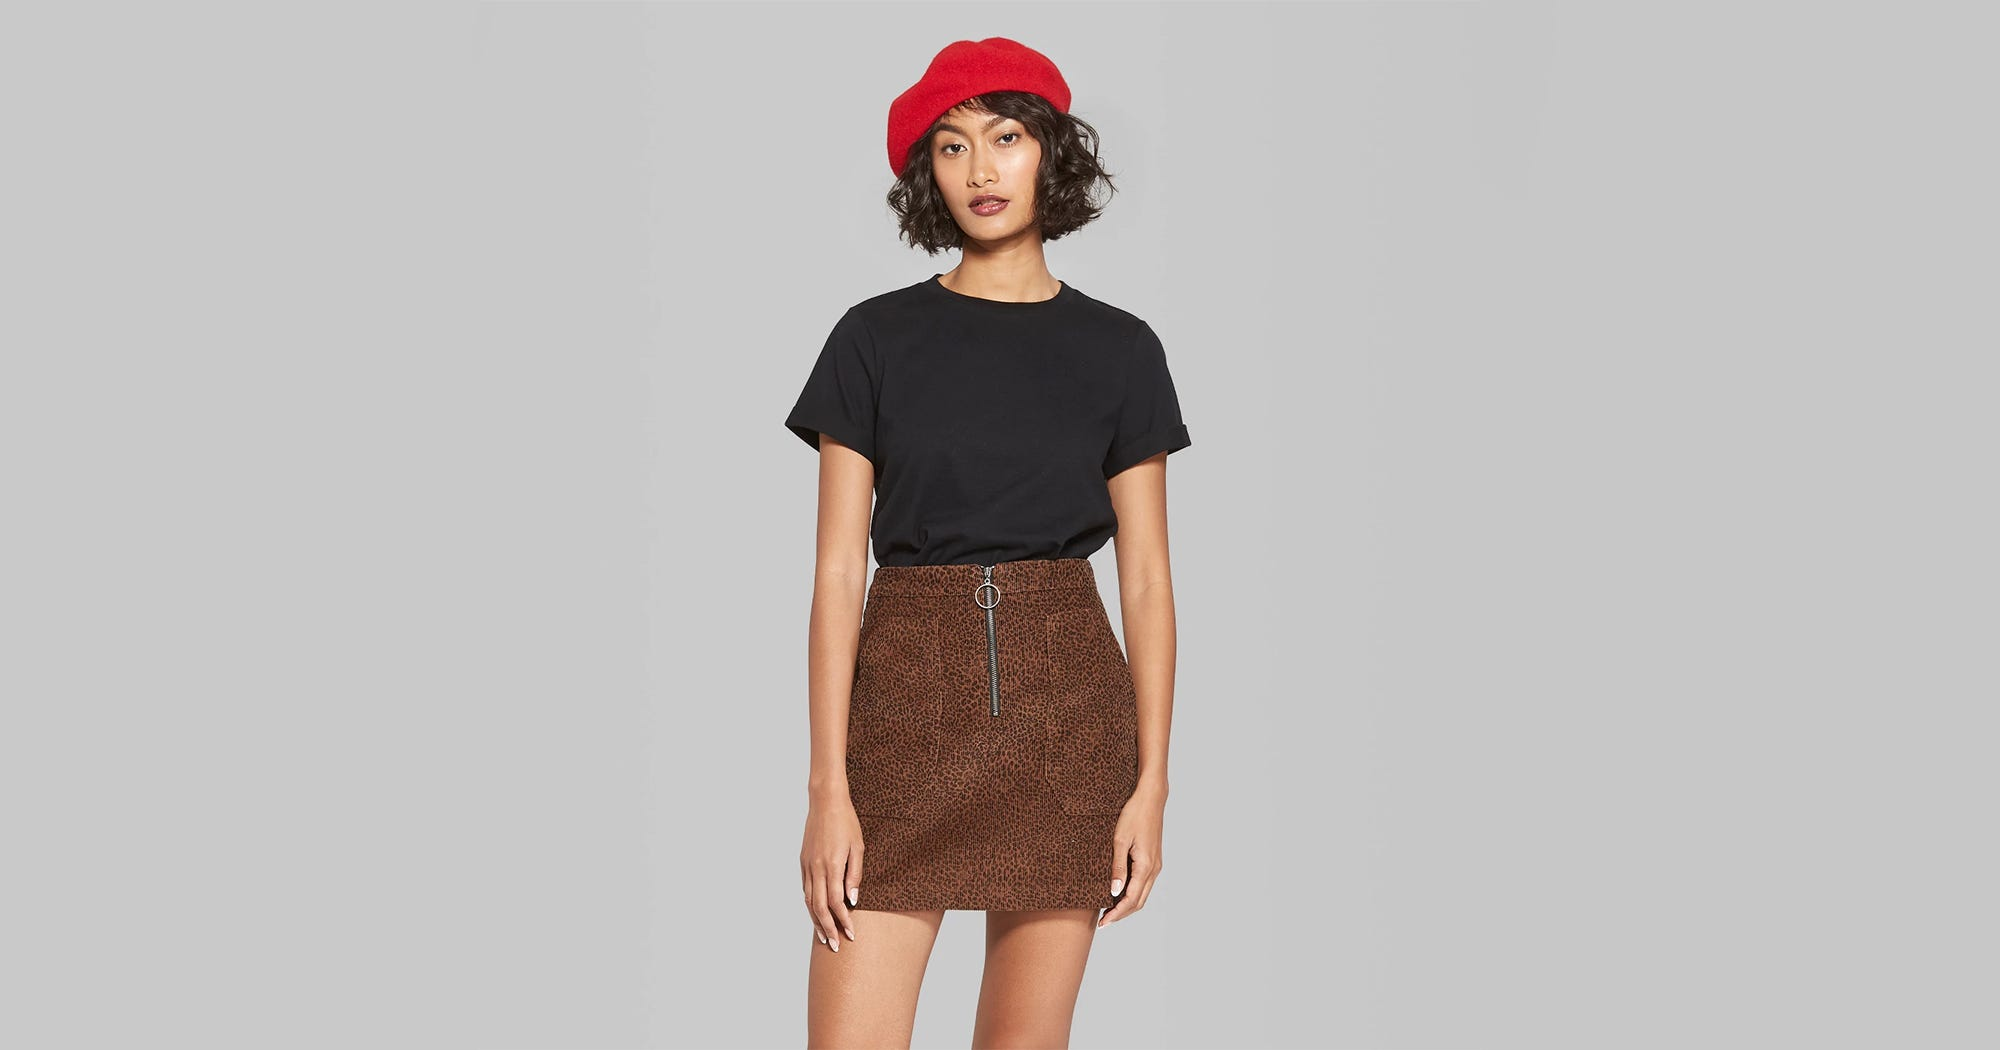 53c2d3e499 Best Quality Womens Black T-Shirts 2019 Brand Reviews